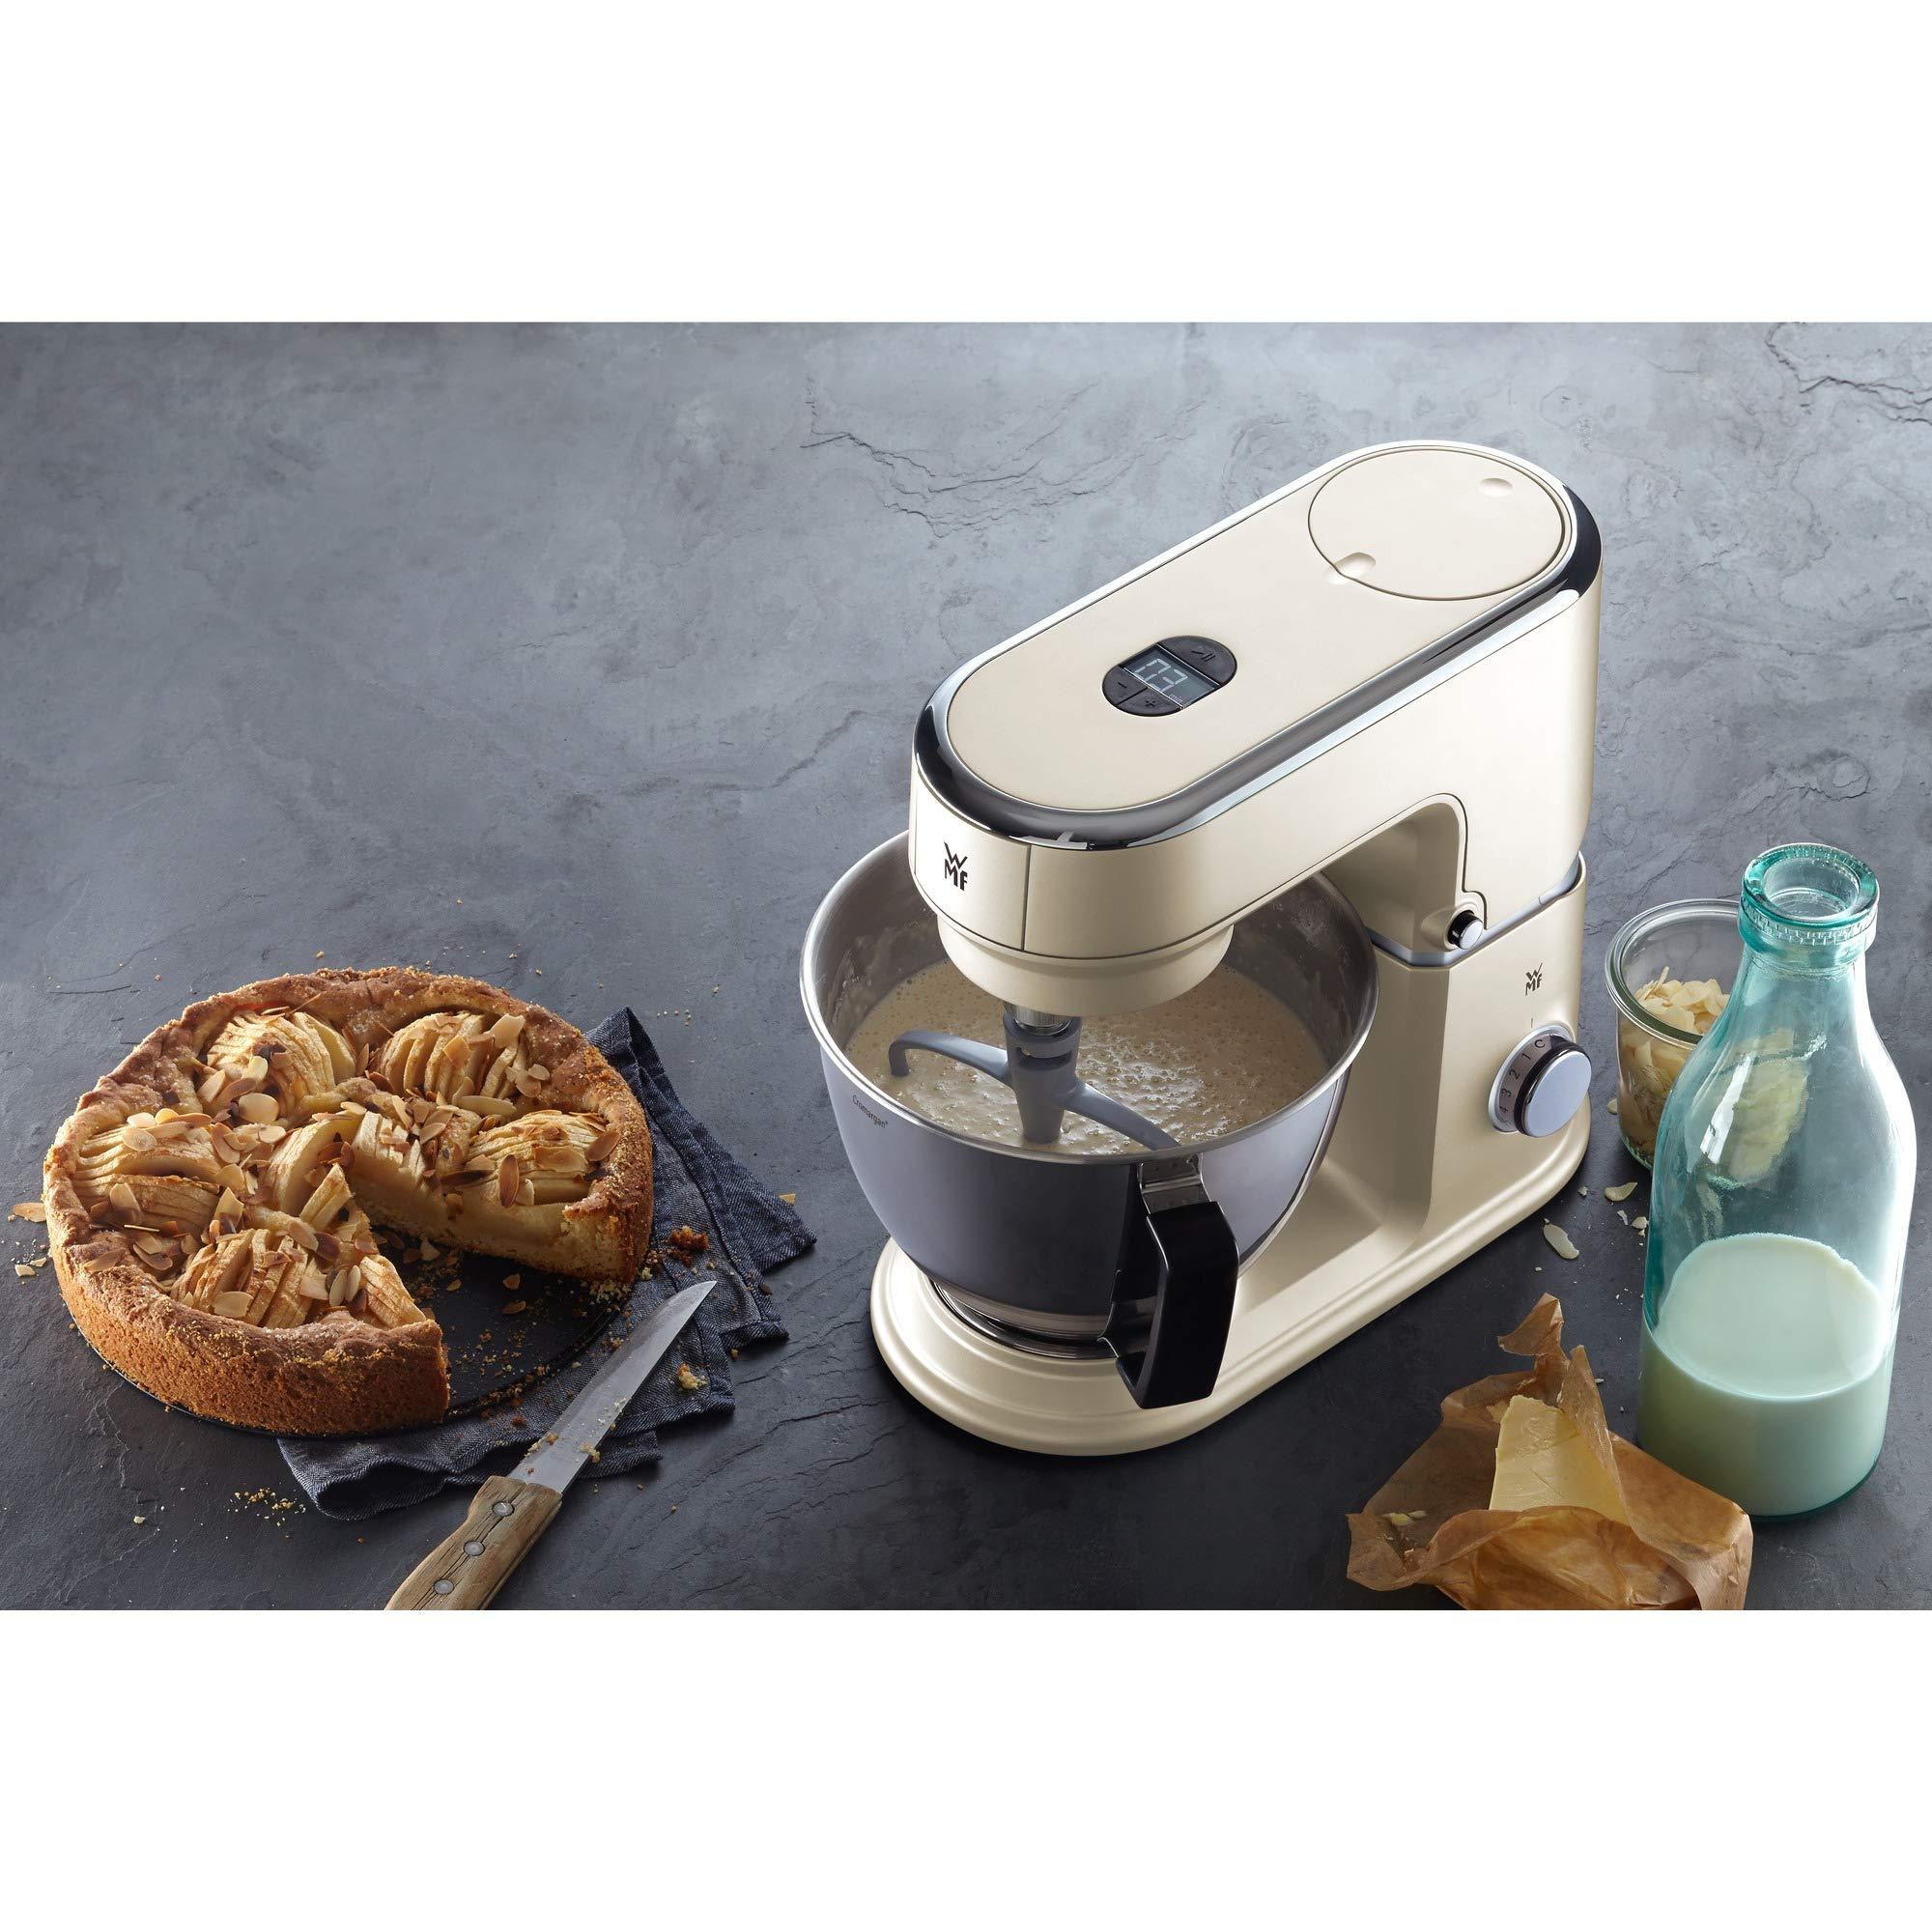 WMF 416680001 Robot de cocina, acwero Inoxidable Cromargan, beige: Amazon.es: Hogar